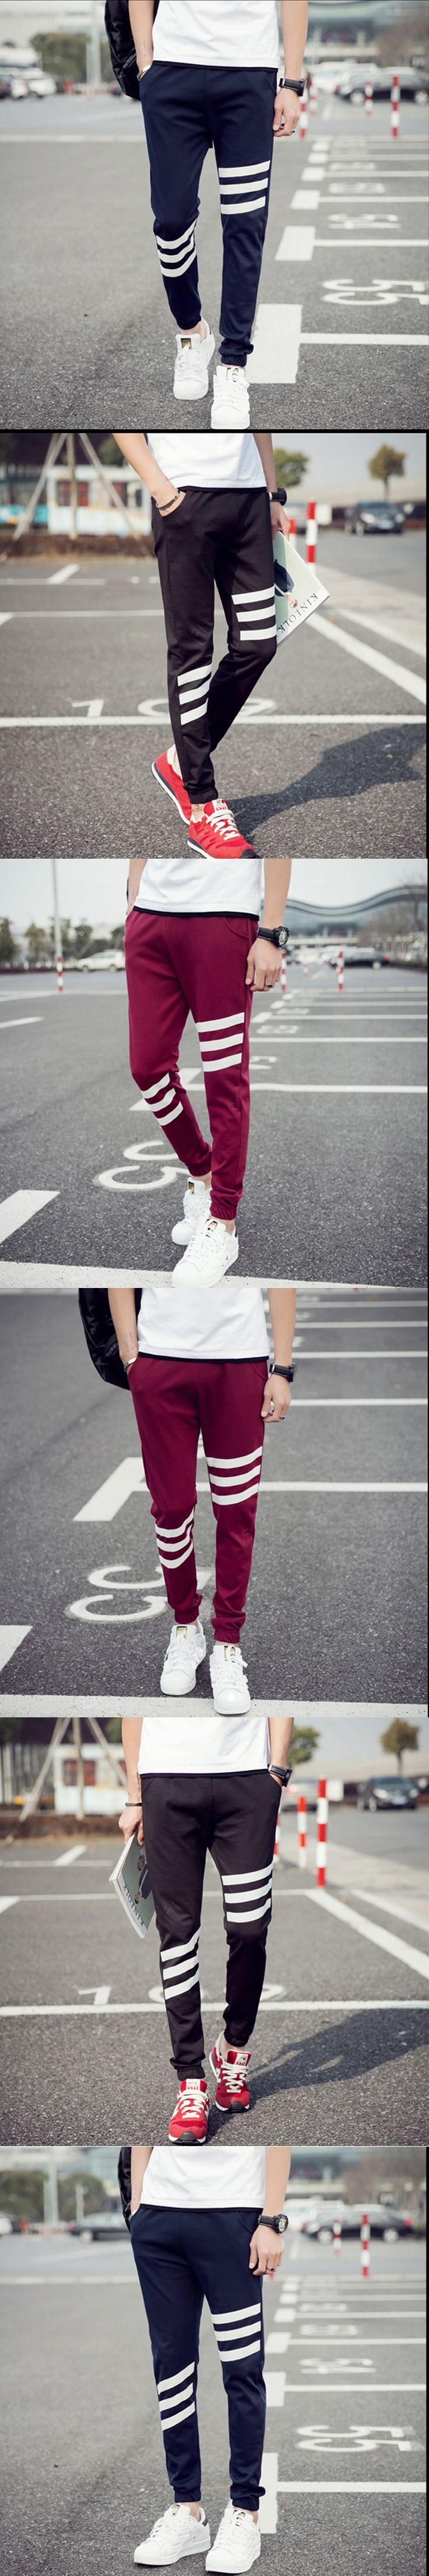 Korea Style Casual Loose Sweatpants Straight Workout Cloth Sporting Active Cotton Pants Men Jogger Pants Sweatpants